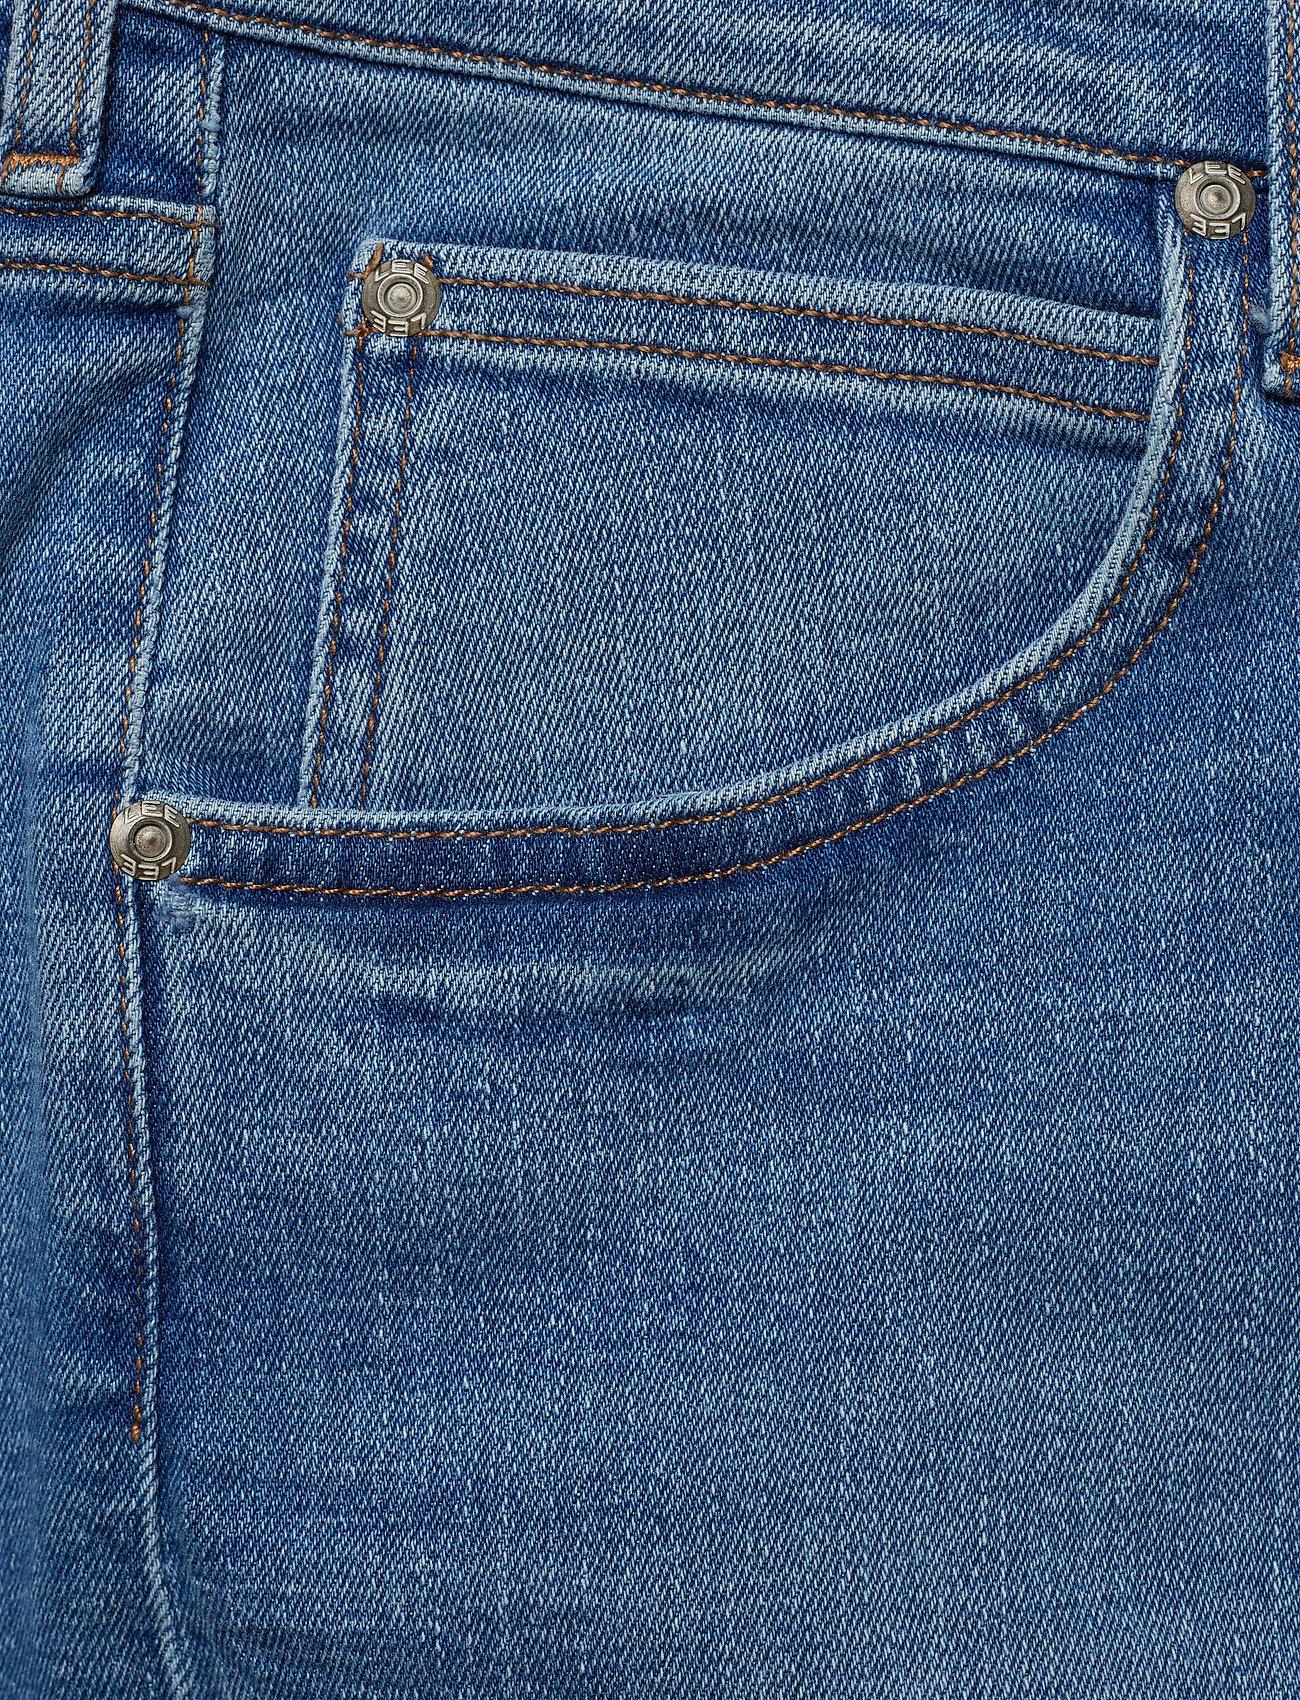 Daren Zip FlyjadedLee FlyjadedLee FlyjadedLee Daren Jeans Zip Zip Zip Daren Jeans Jeans Daren ukXPiZ